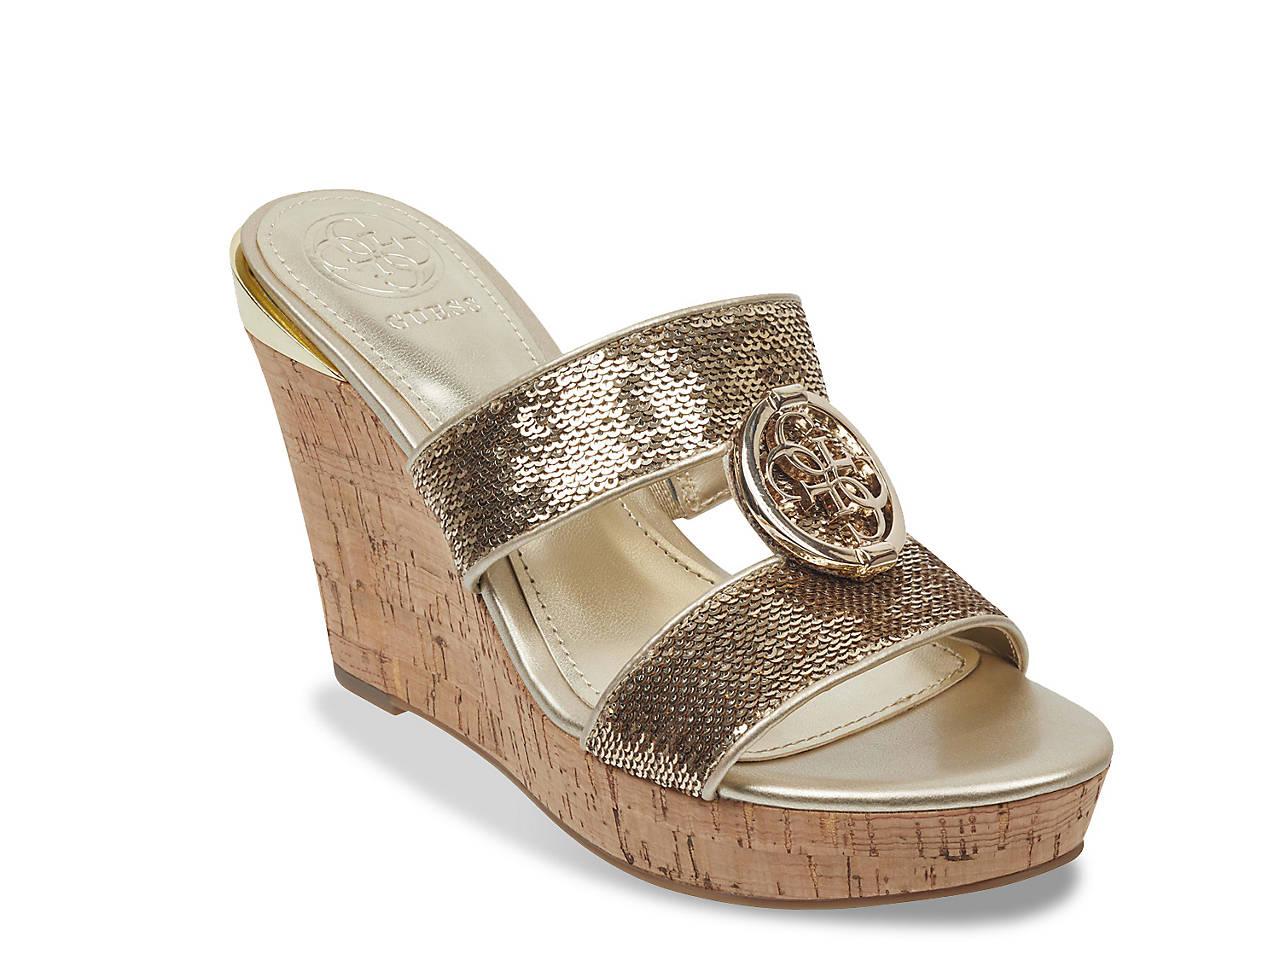 af435a11a83d Guess Beanca Wedge Sandal Women s Shoes